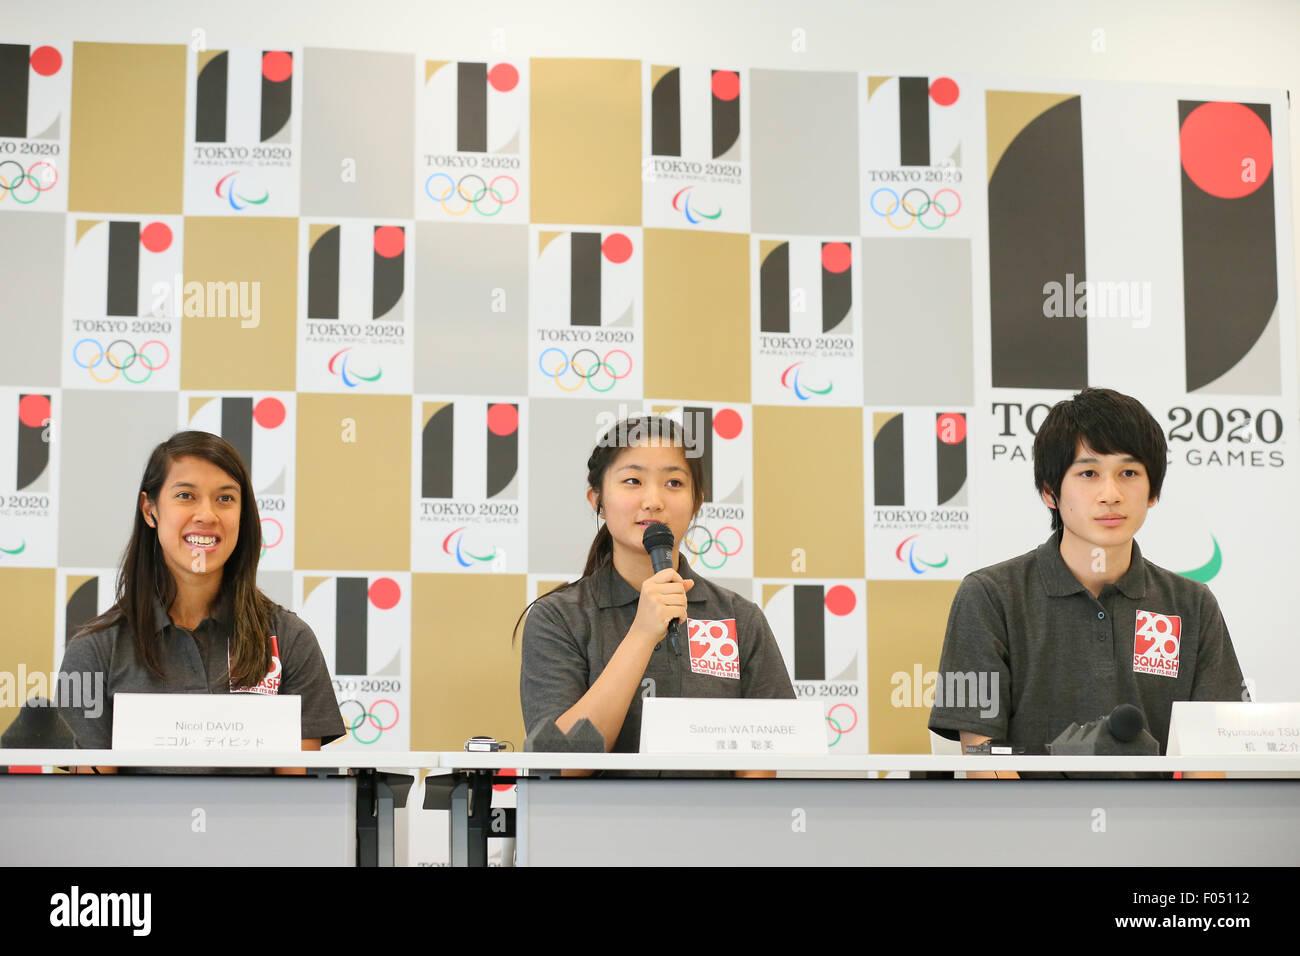 (L to R) Nicol David, Satomi Watanabe, Ryunosuke Tsukue, AUGUST 7, 2015 : World Squash Federation (WSF) holds a - Stock Image